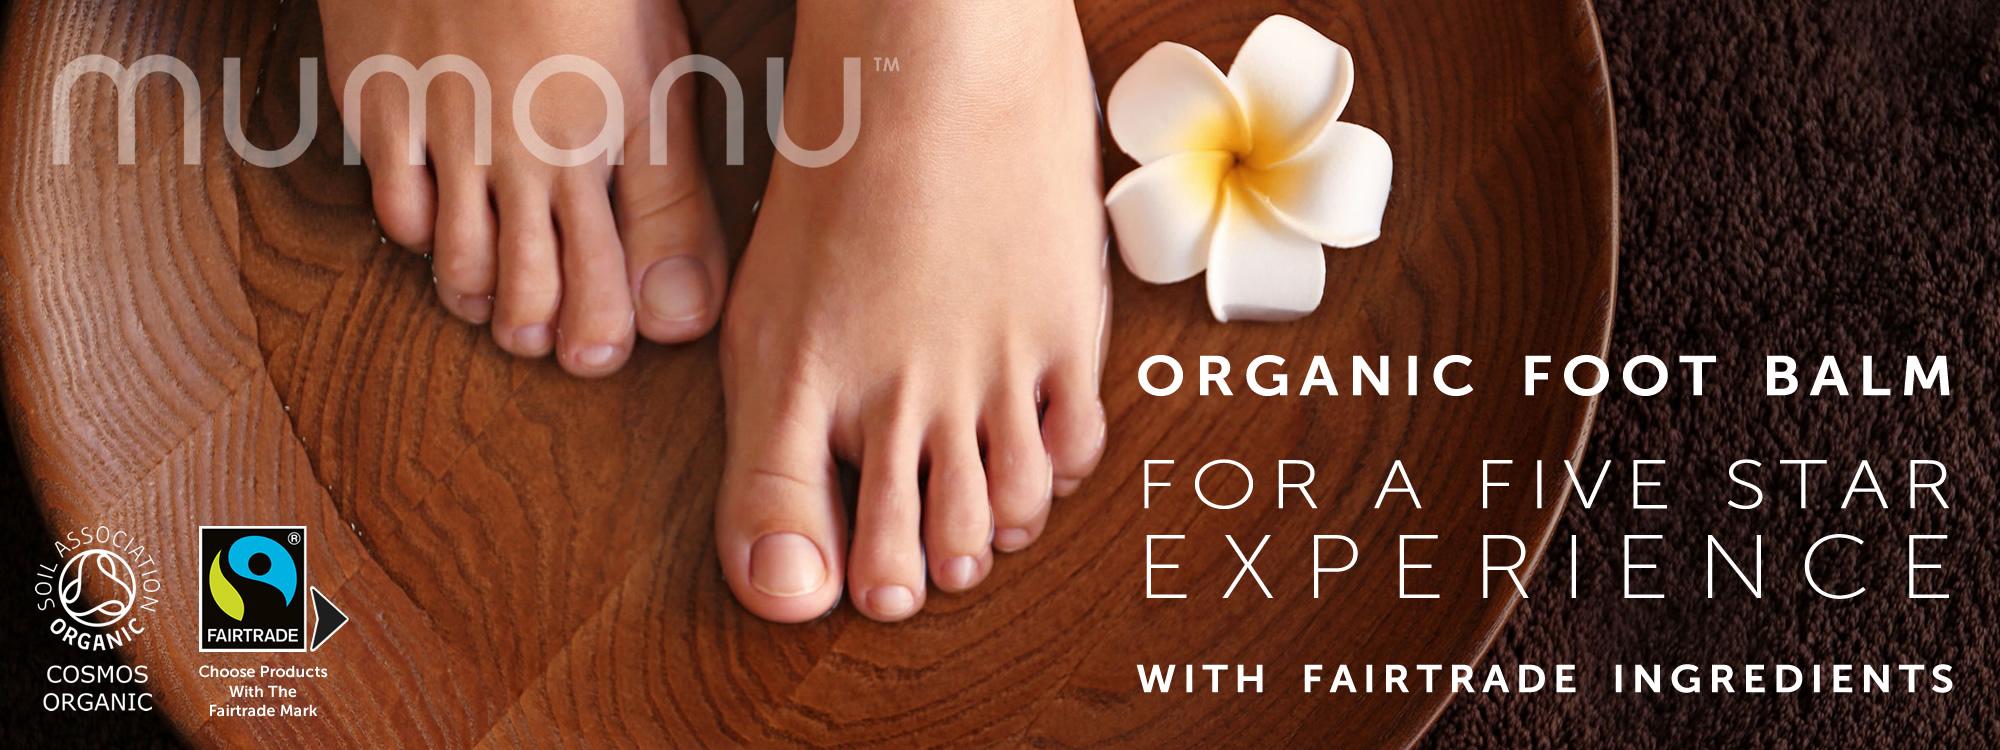 Mumanu Organic Foot Massage Oil, Heel Balm & Foot Cream With Fairtrade Ingredients